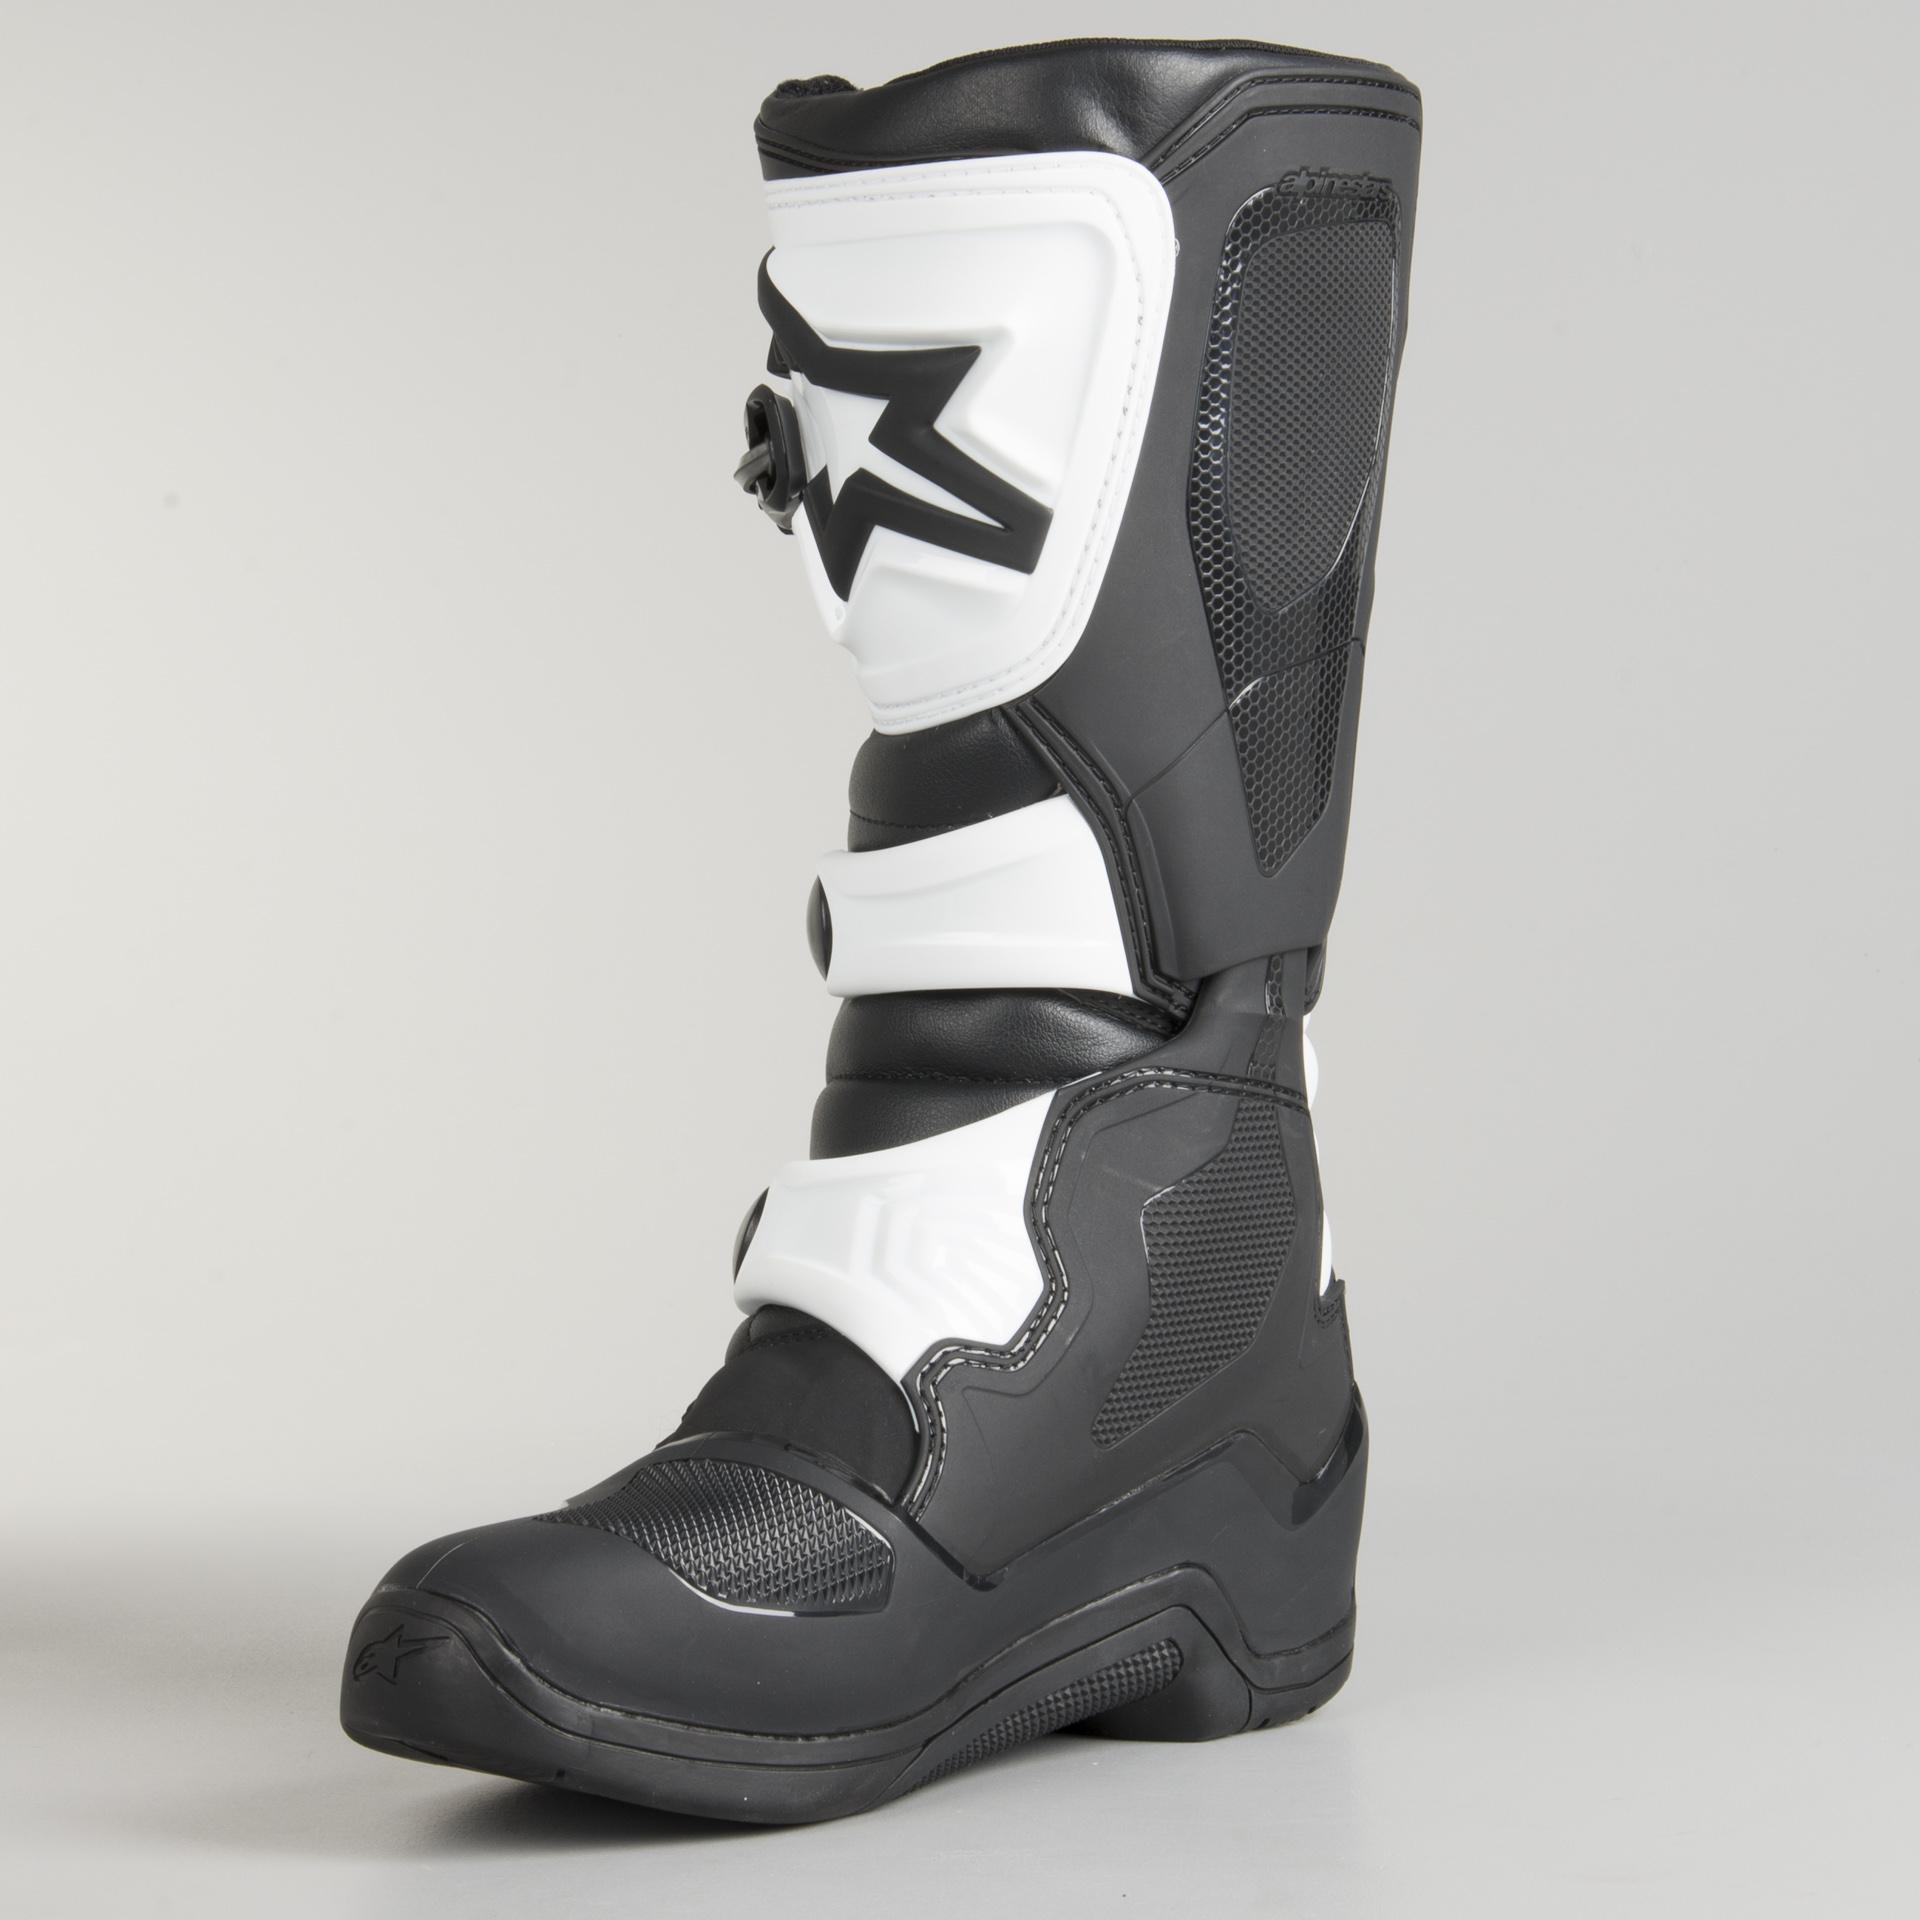 Alpinestars Tech 3 Boots Black White Now 5% Savings